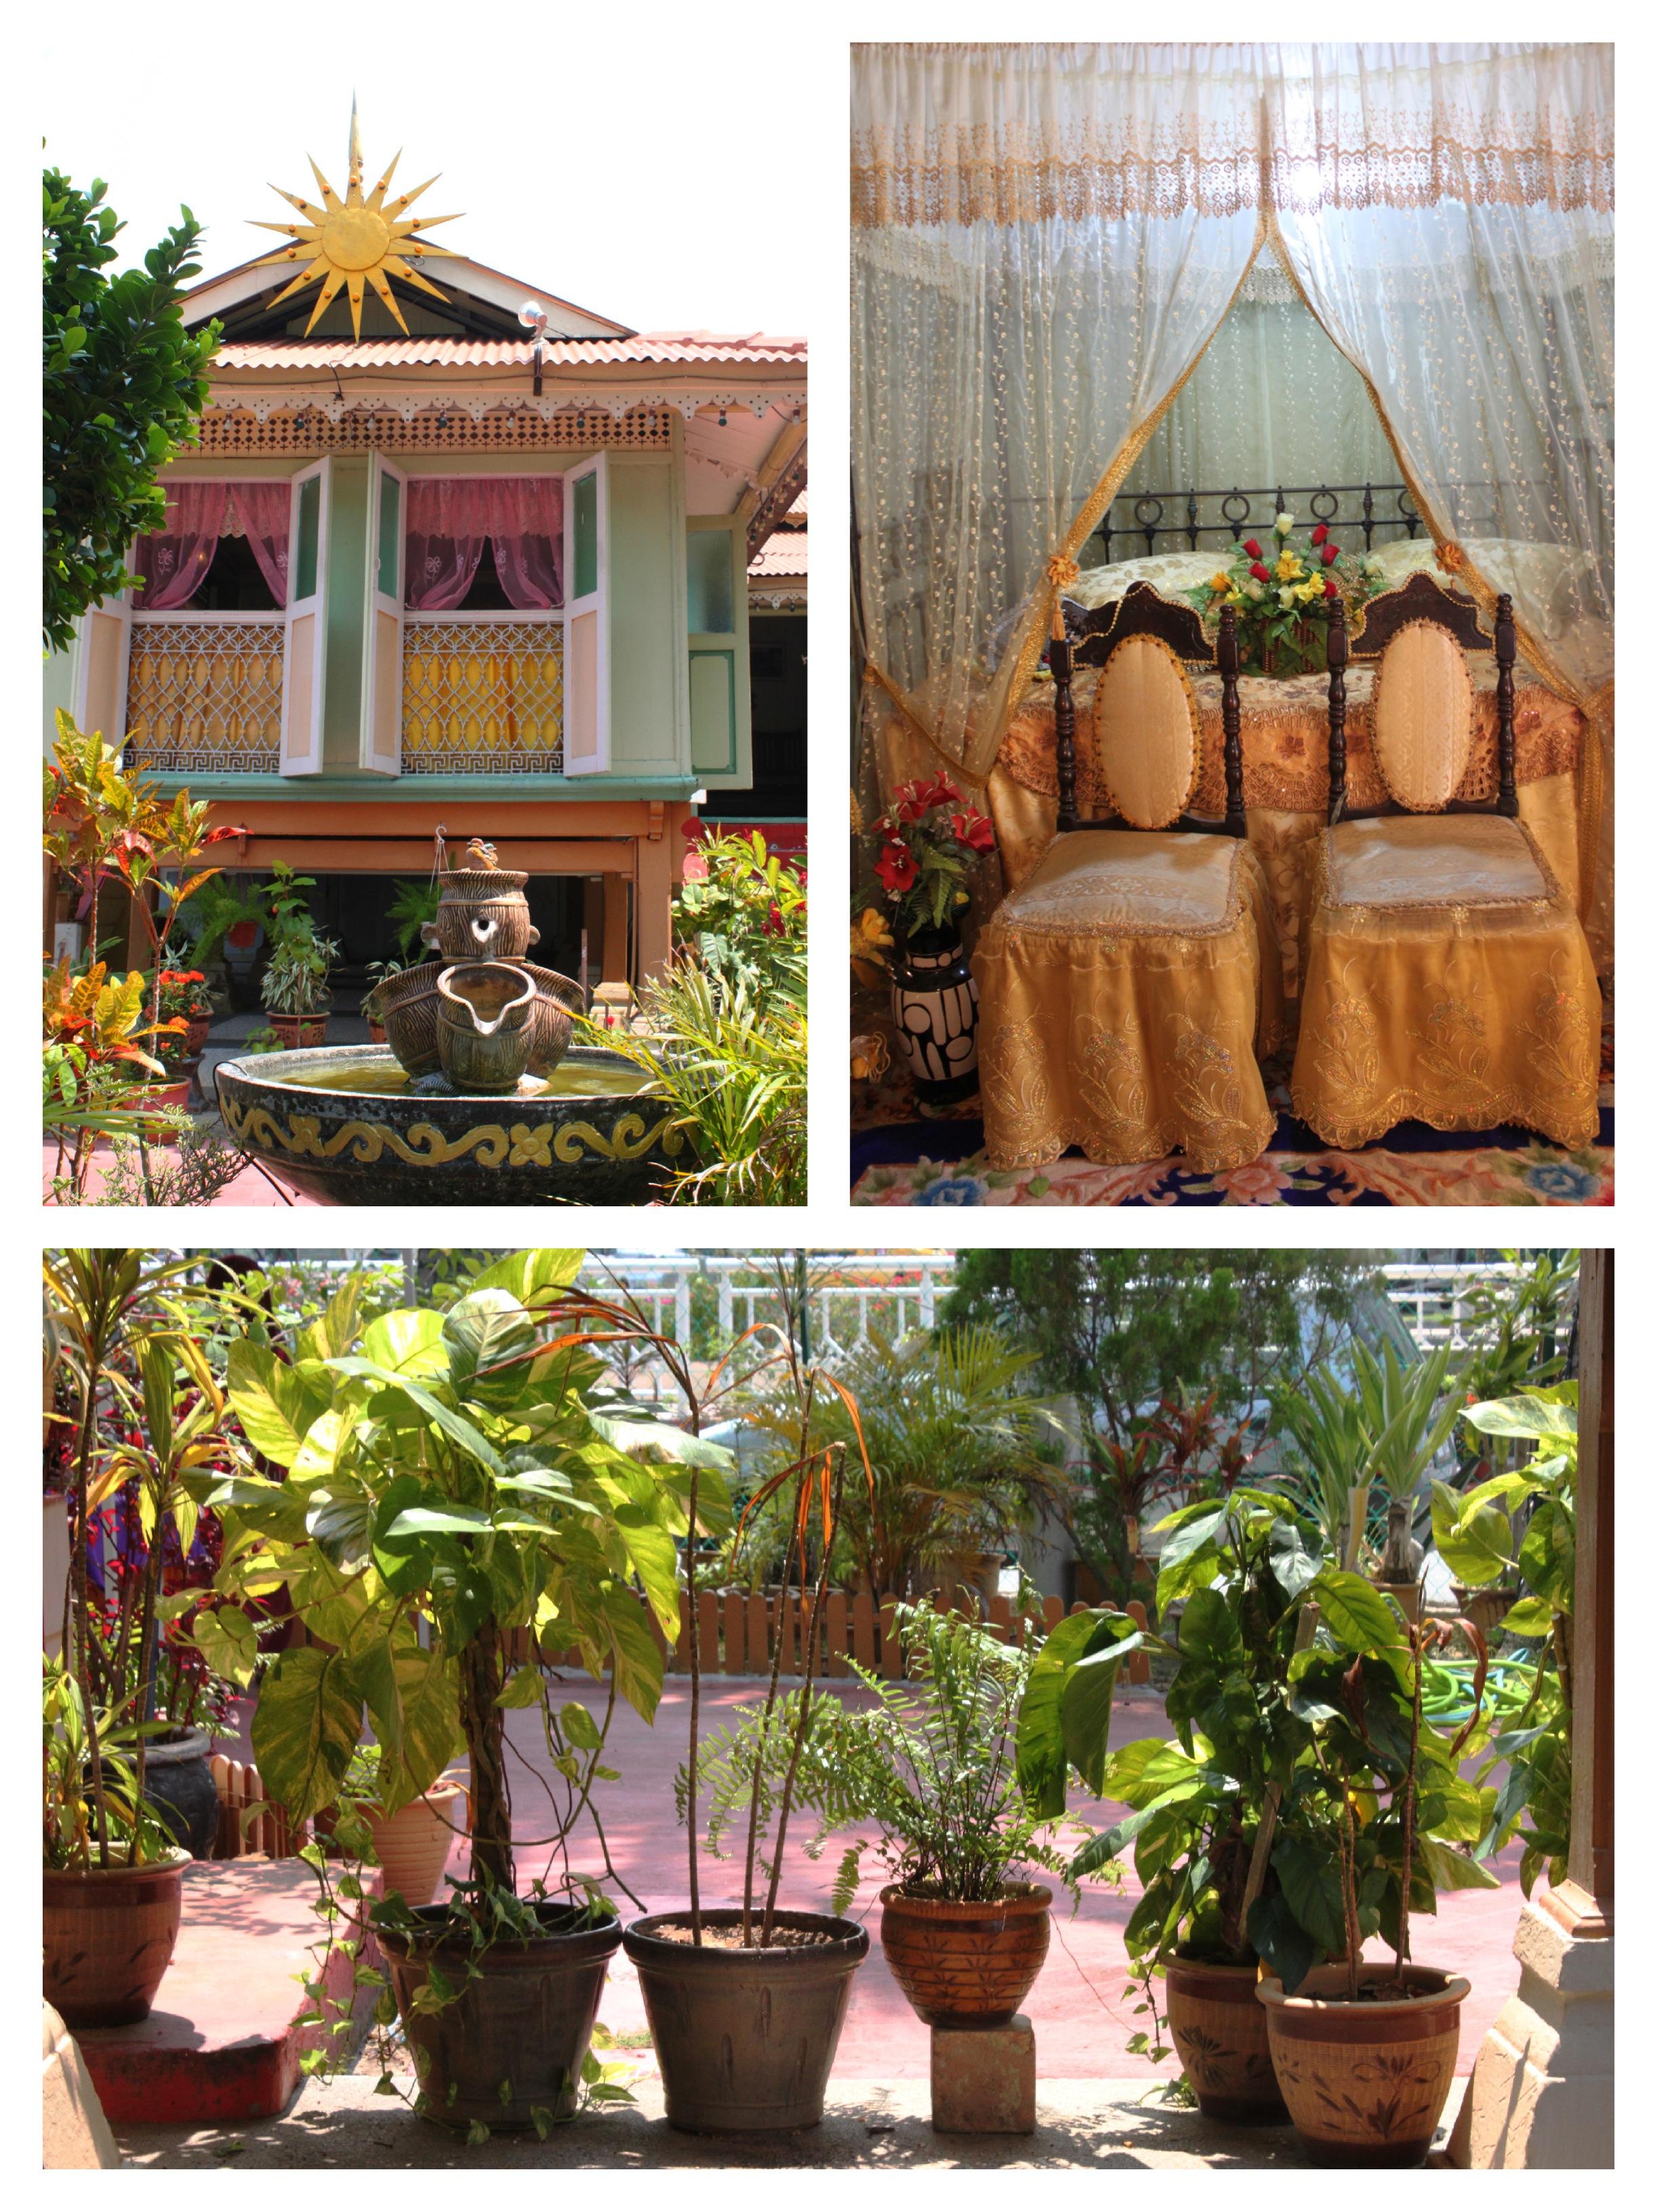 Villa Sentosa, Malacca, Melaka, Malesia